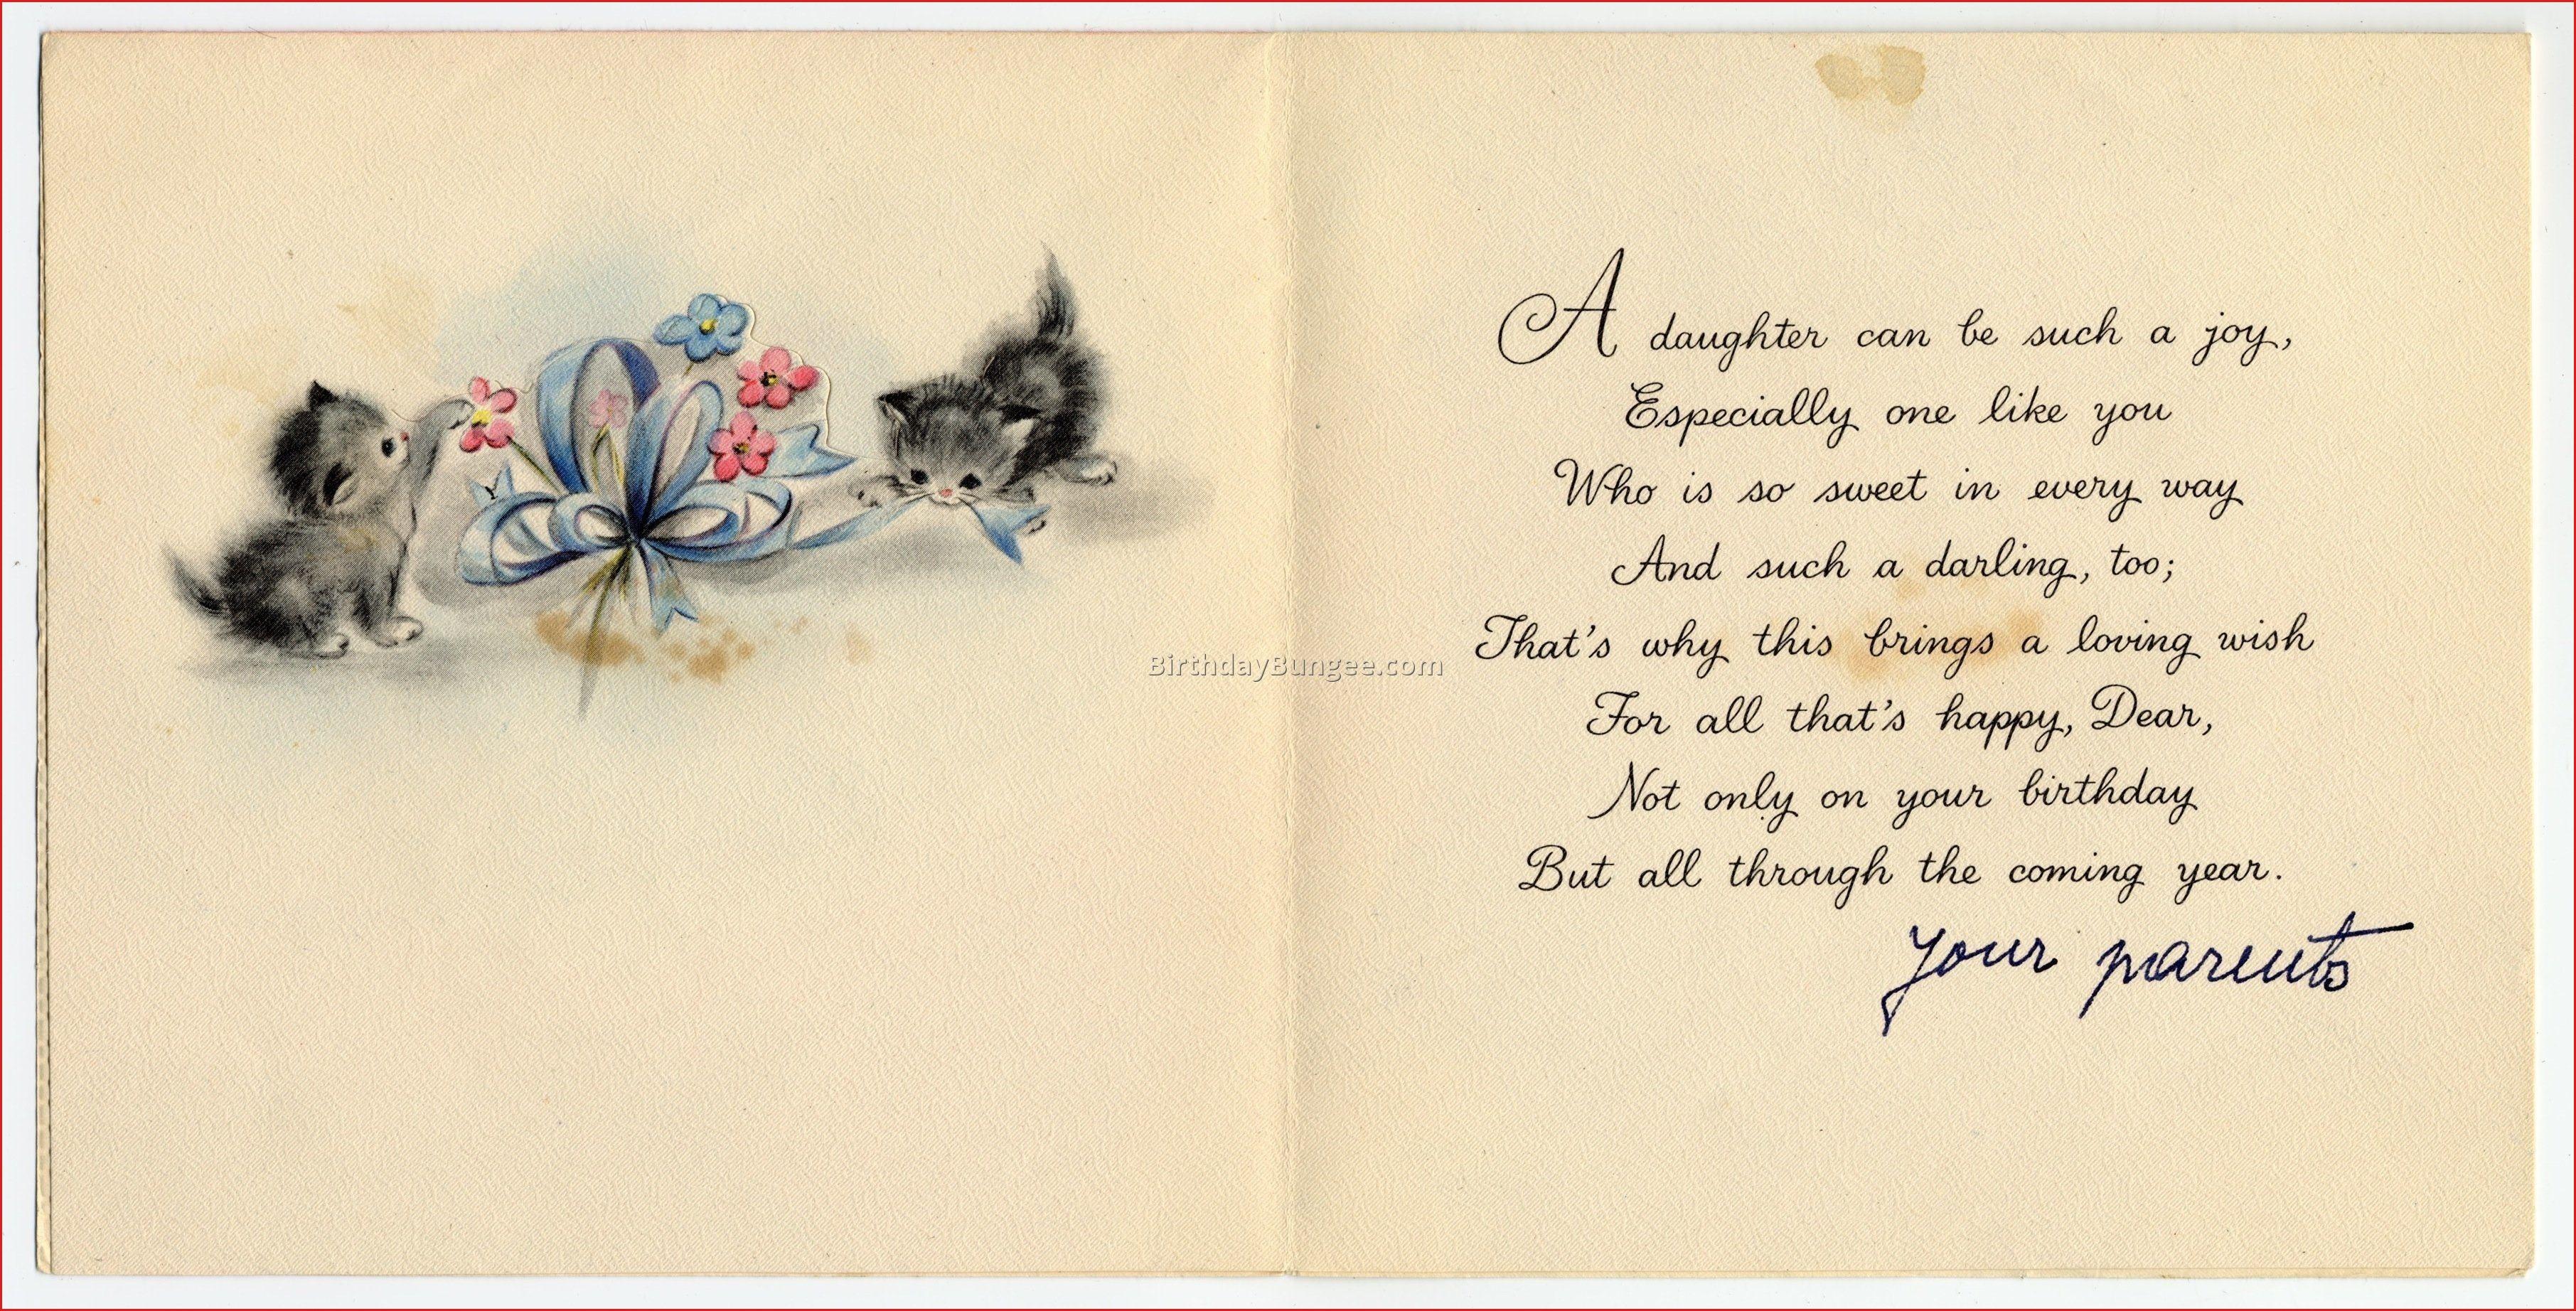 16 Best Hallmark Birthday Cards For Daughter : Lenq - Free Printable Greeting Cards Hallmark